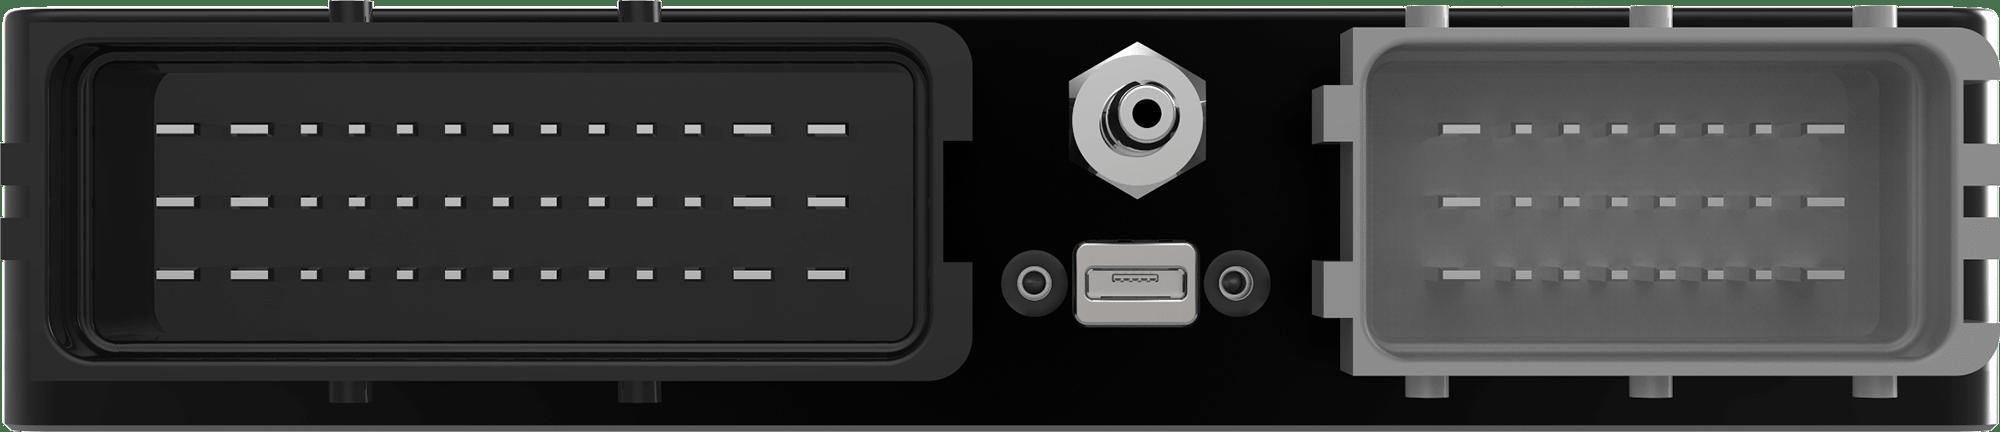 Ecumaster Emu Black Ford Focus Tps Wiring Diagram Connector Front